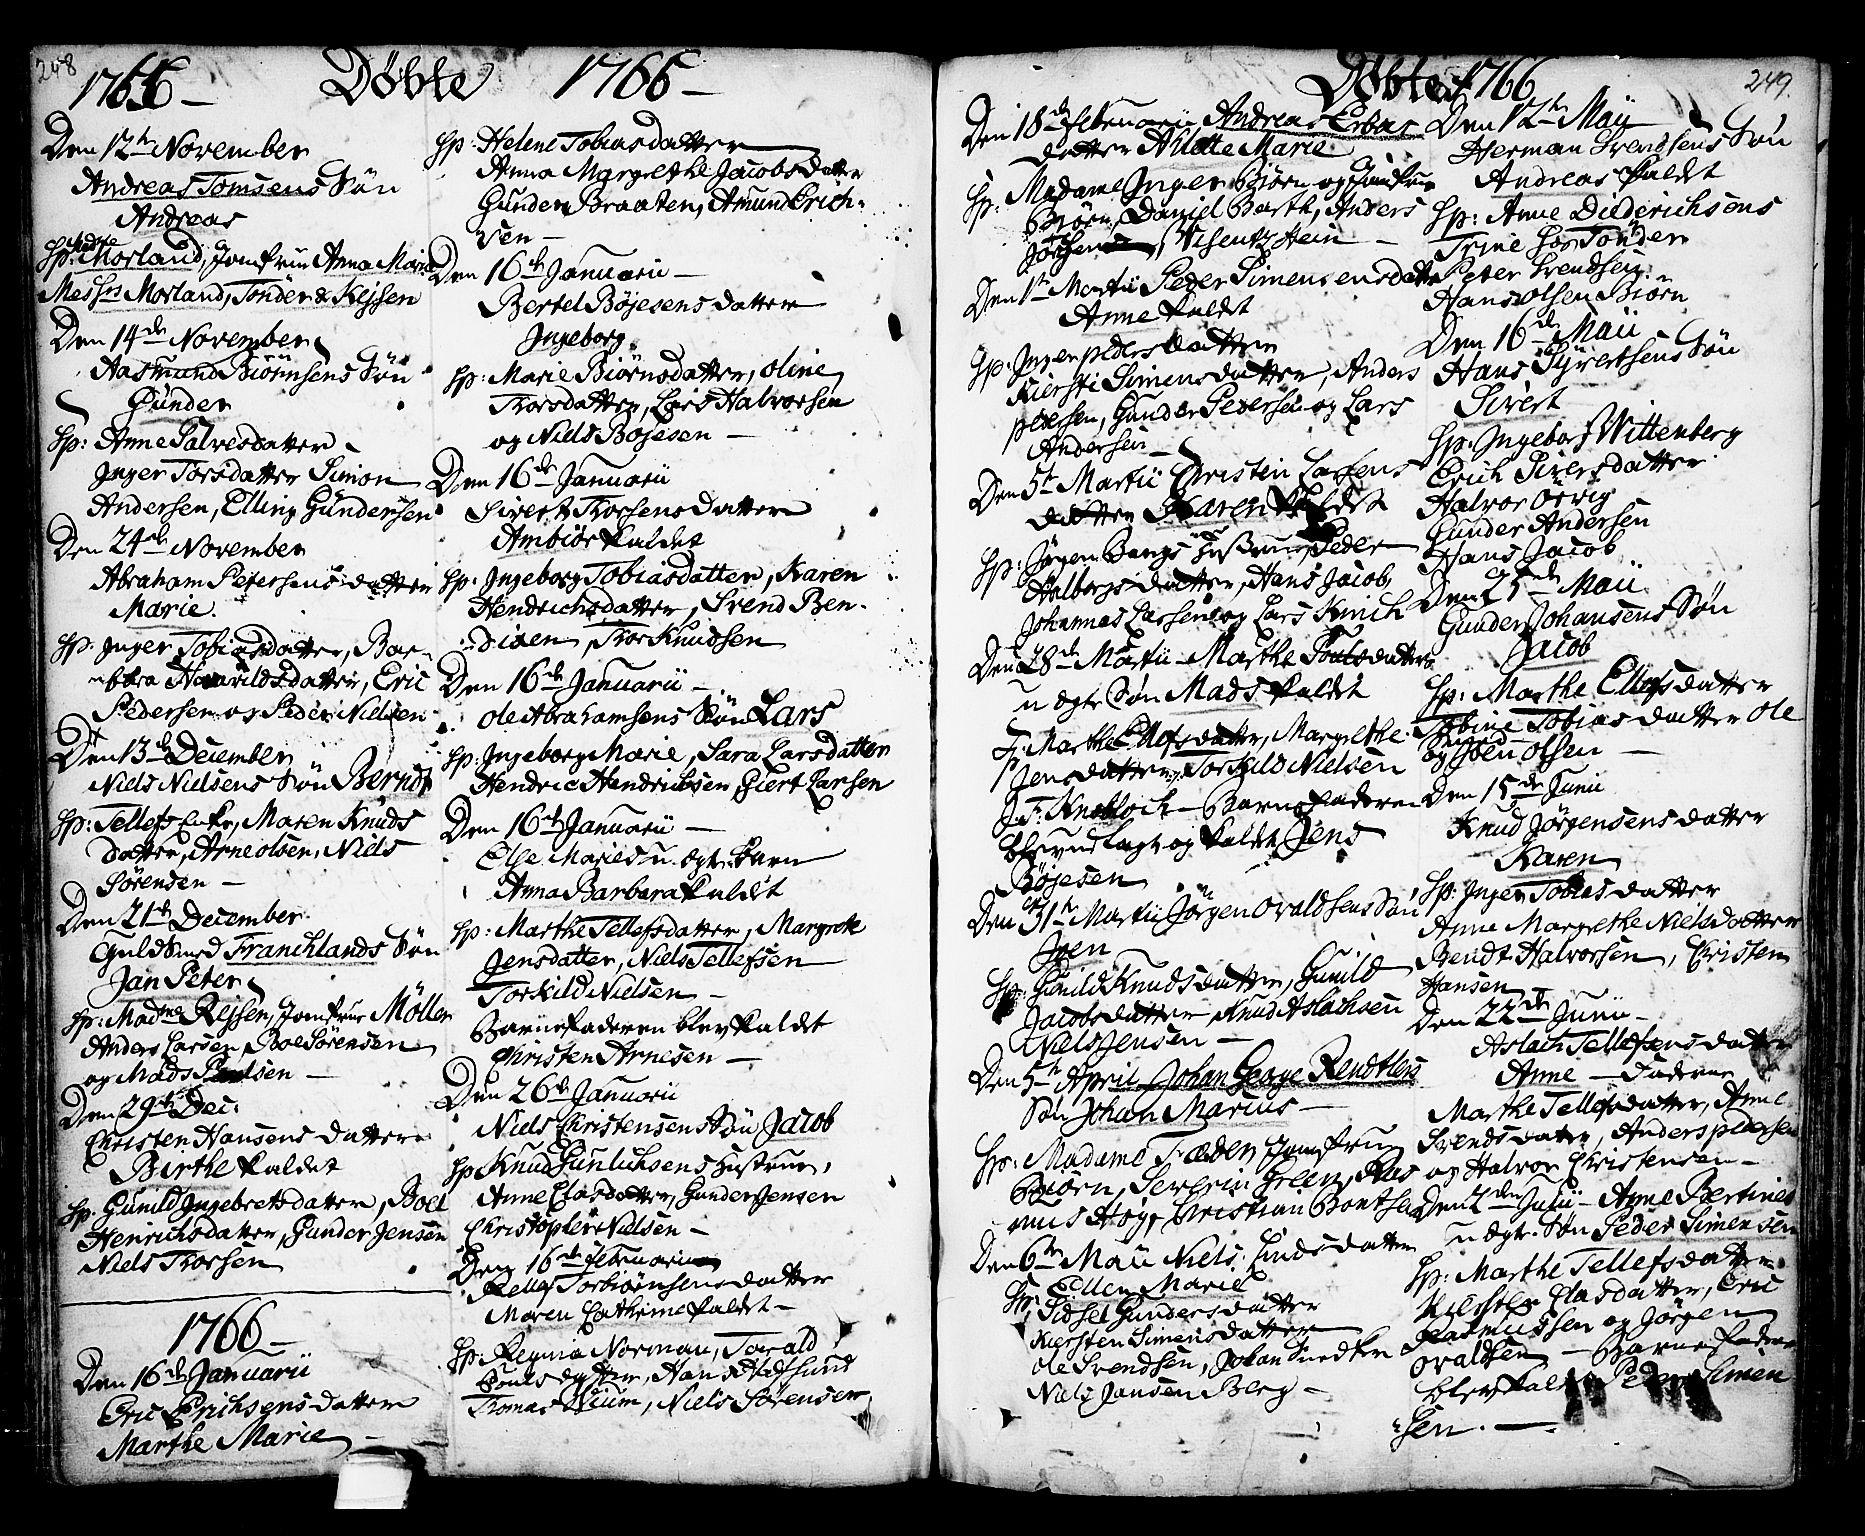 SAKO, Kragerø kirkebøker, F/Fa/L0001: Ministerialbok nr. 1, 1702-1766, s. 248-249